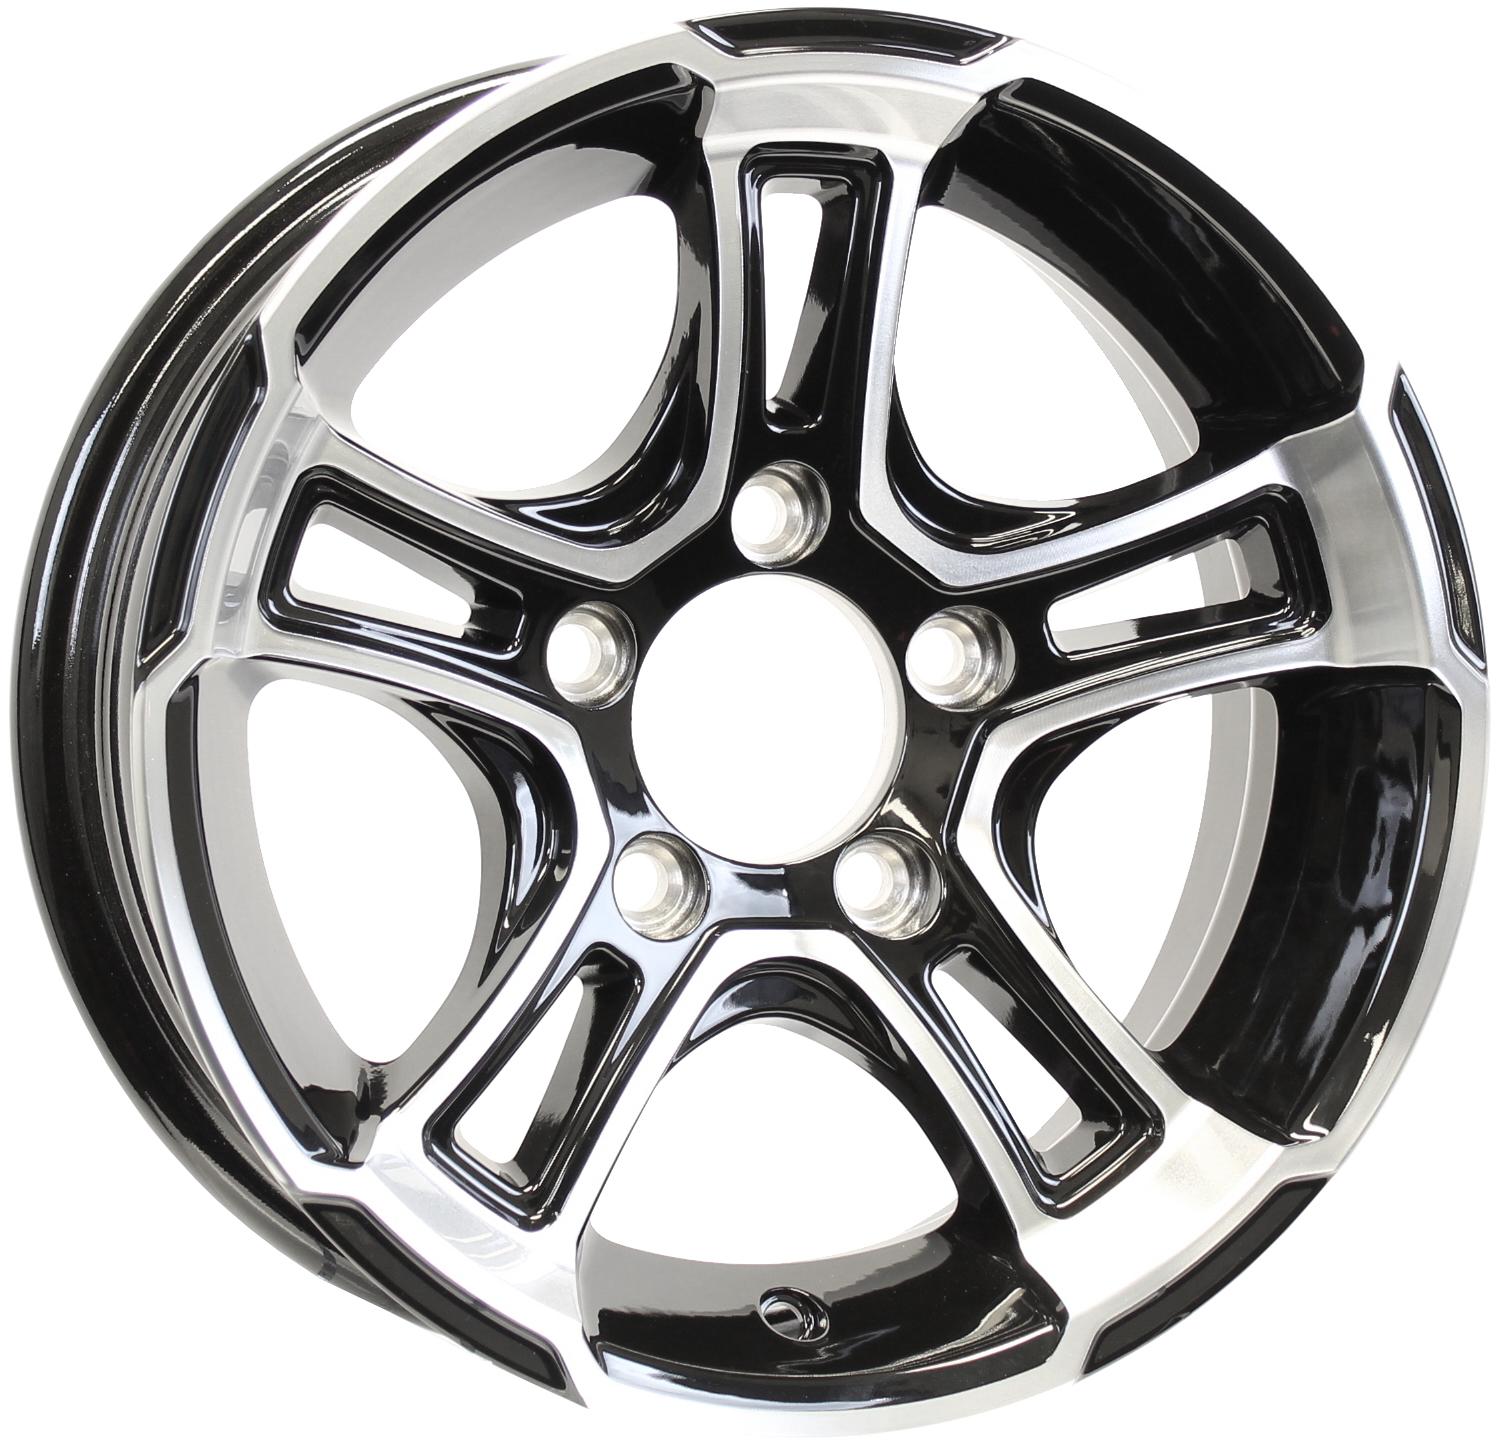 Whitehawk 14x5.5 5-4.5 Black/Machine Aluminum Trailer Wheel Image